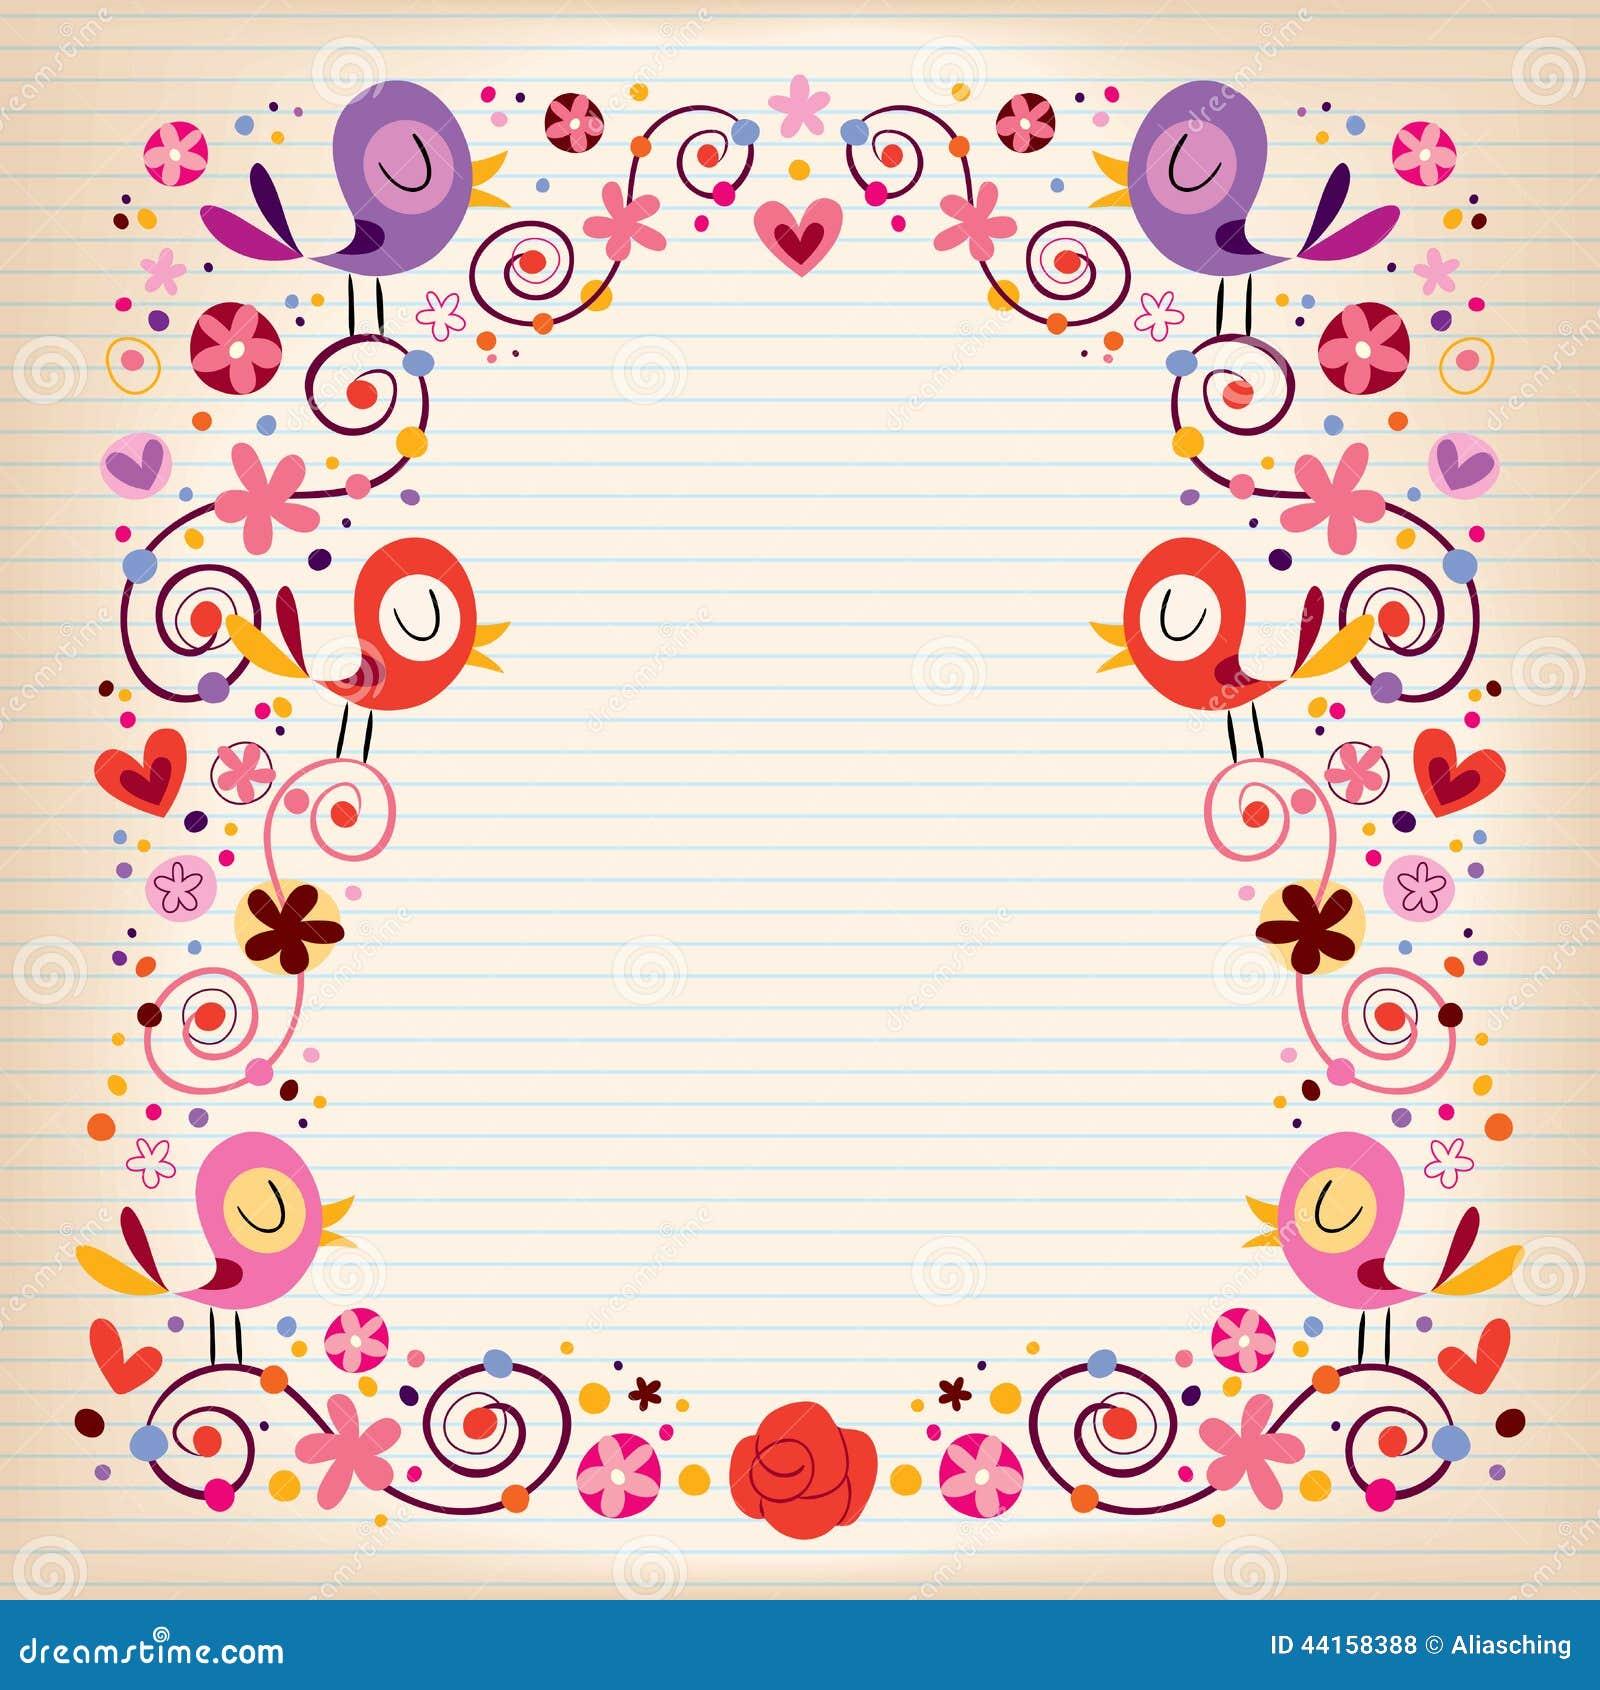 cute border designs flowers wwwpixsharkcom images